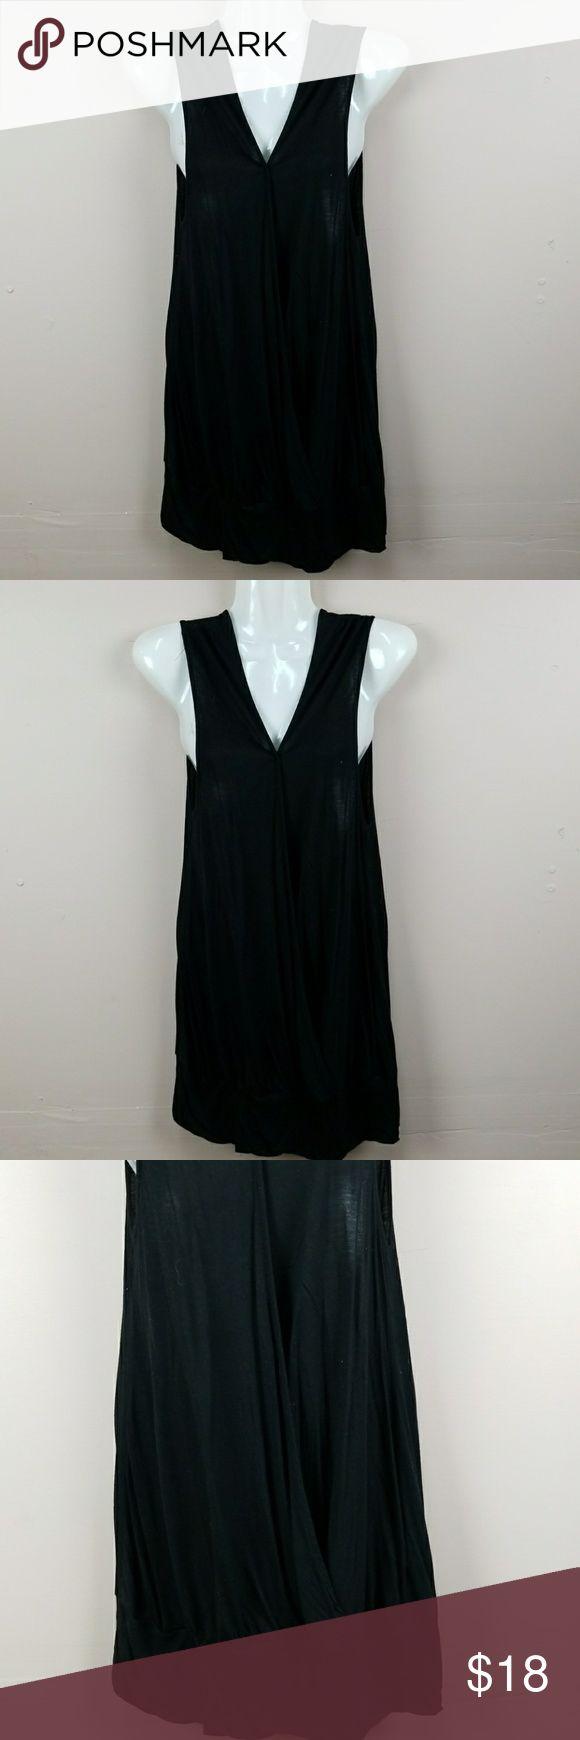 GAP TOP GAP TOP. Size L Plus, black long tunic length, waist band GAP Tops Tunics